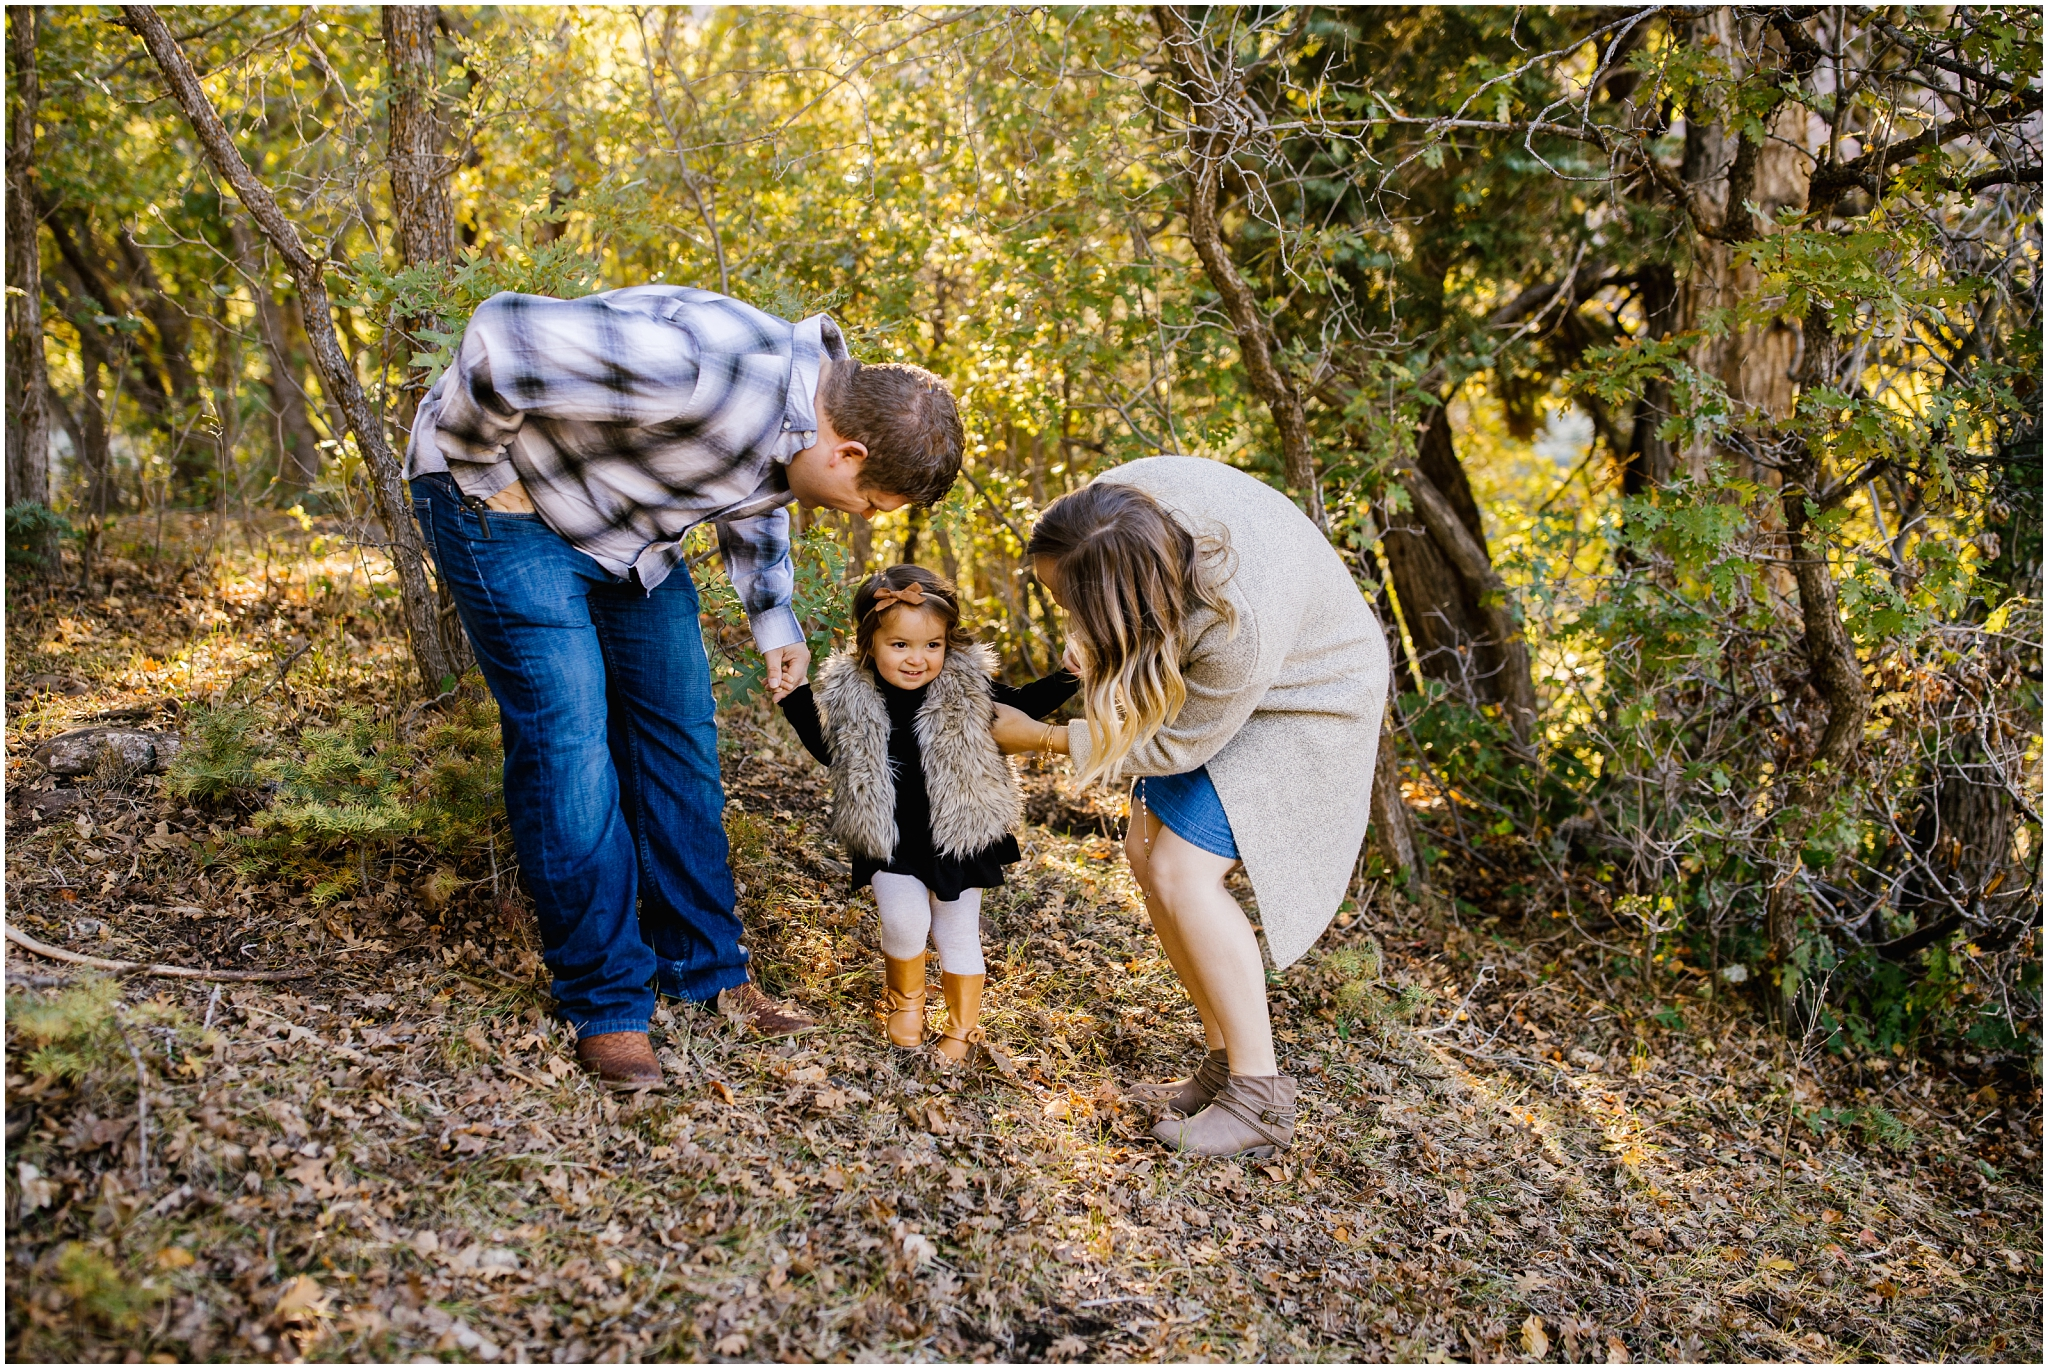 Frandsen-1_Lizzie-B-Imagery-Utah-Family-Photographer-Utah-County-Central-Utah-Park-City-Salt-Lake-City.jpg